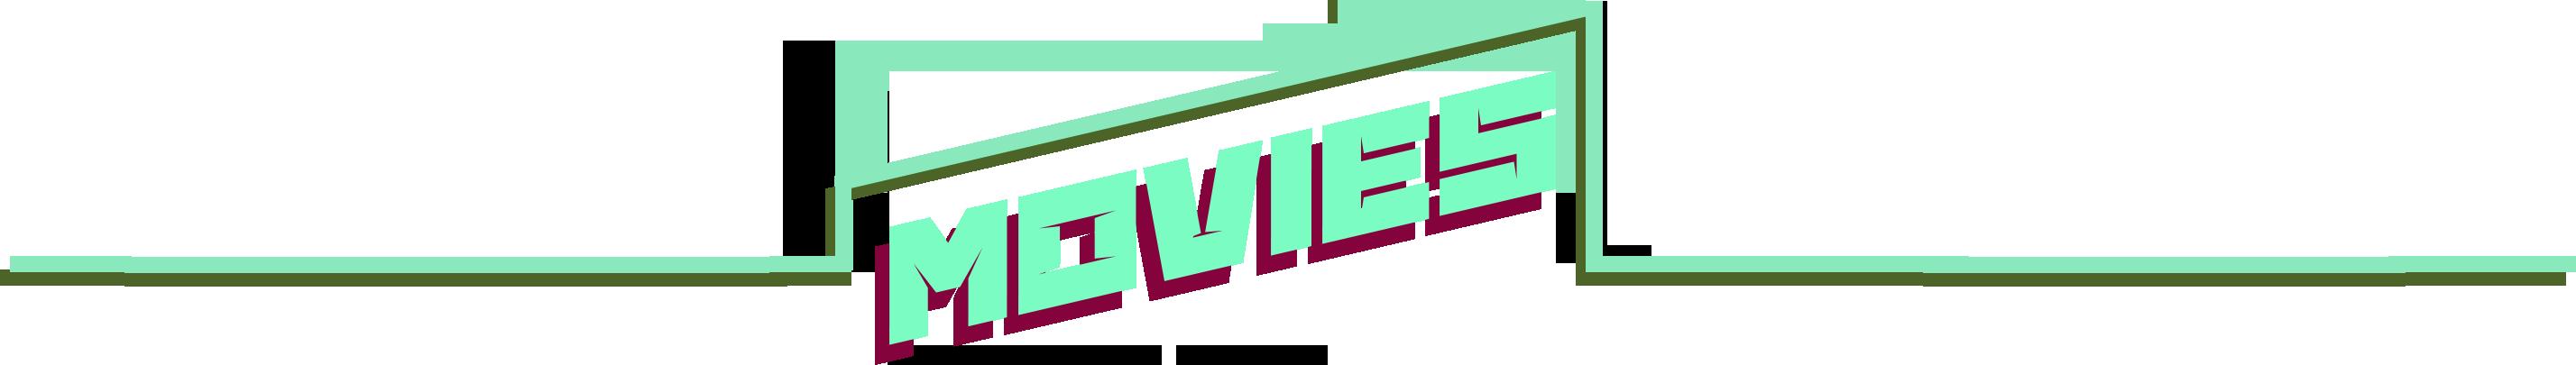 MoviesHeaderr